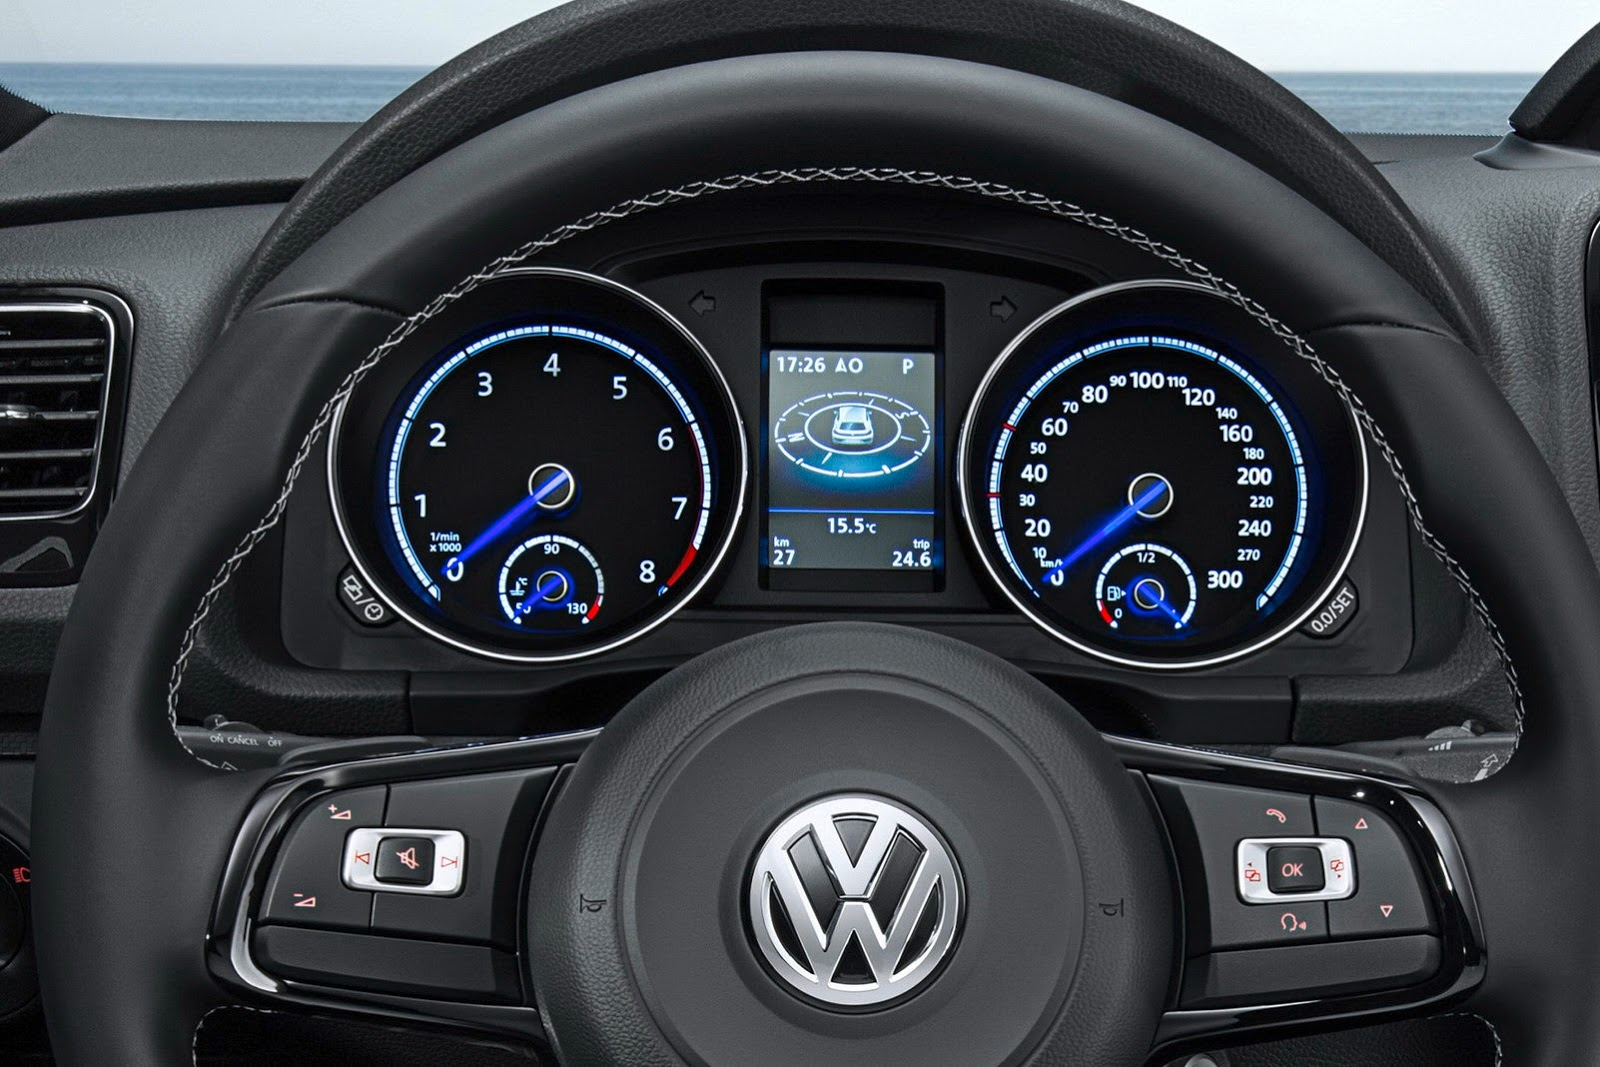 2015 Jetta Gli >> Volkswagen Cars - News: 2015 Scirocco R pricing and specifications